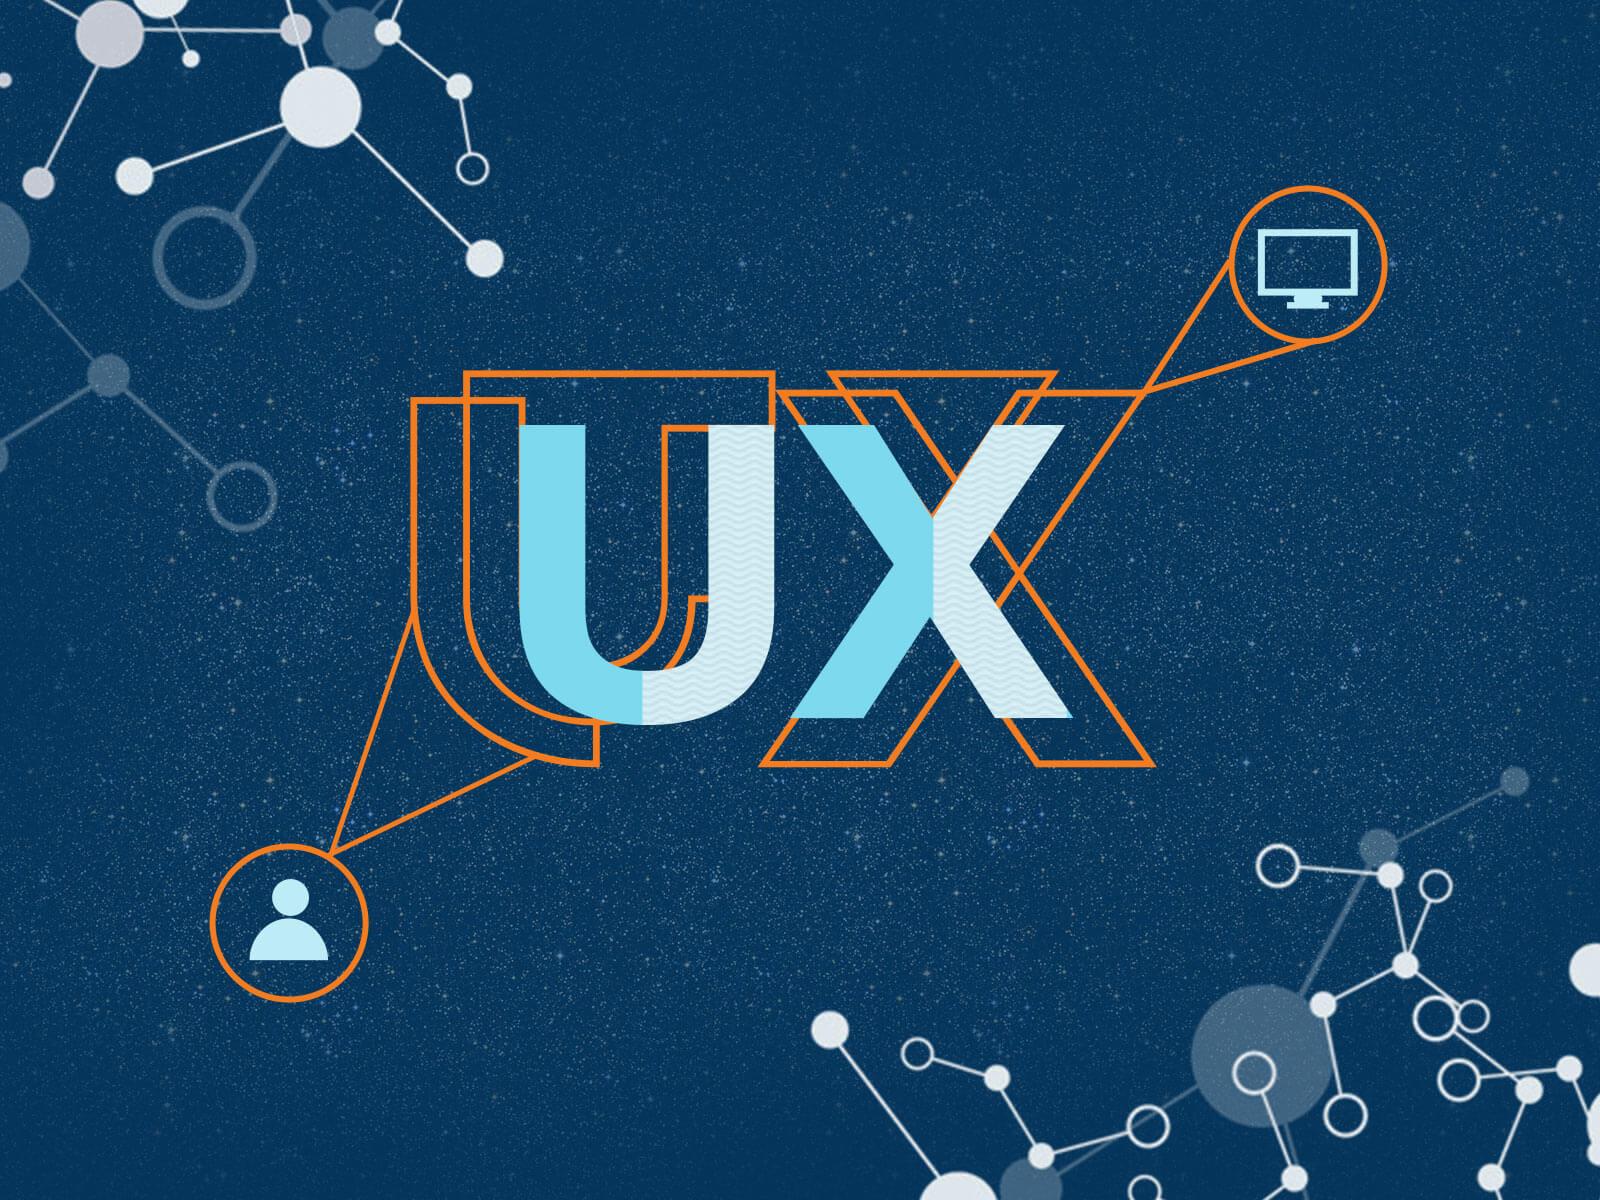 Gebruikerservaring - gebruiksvriendelijkheid van je website